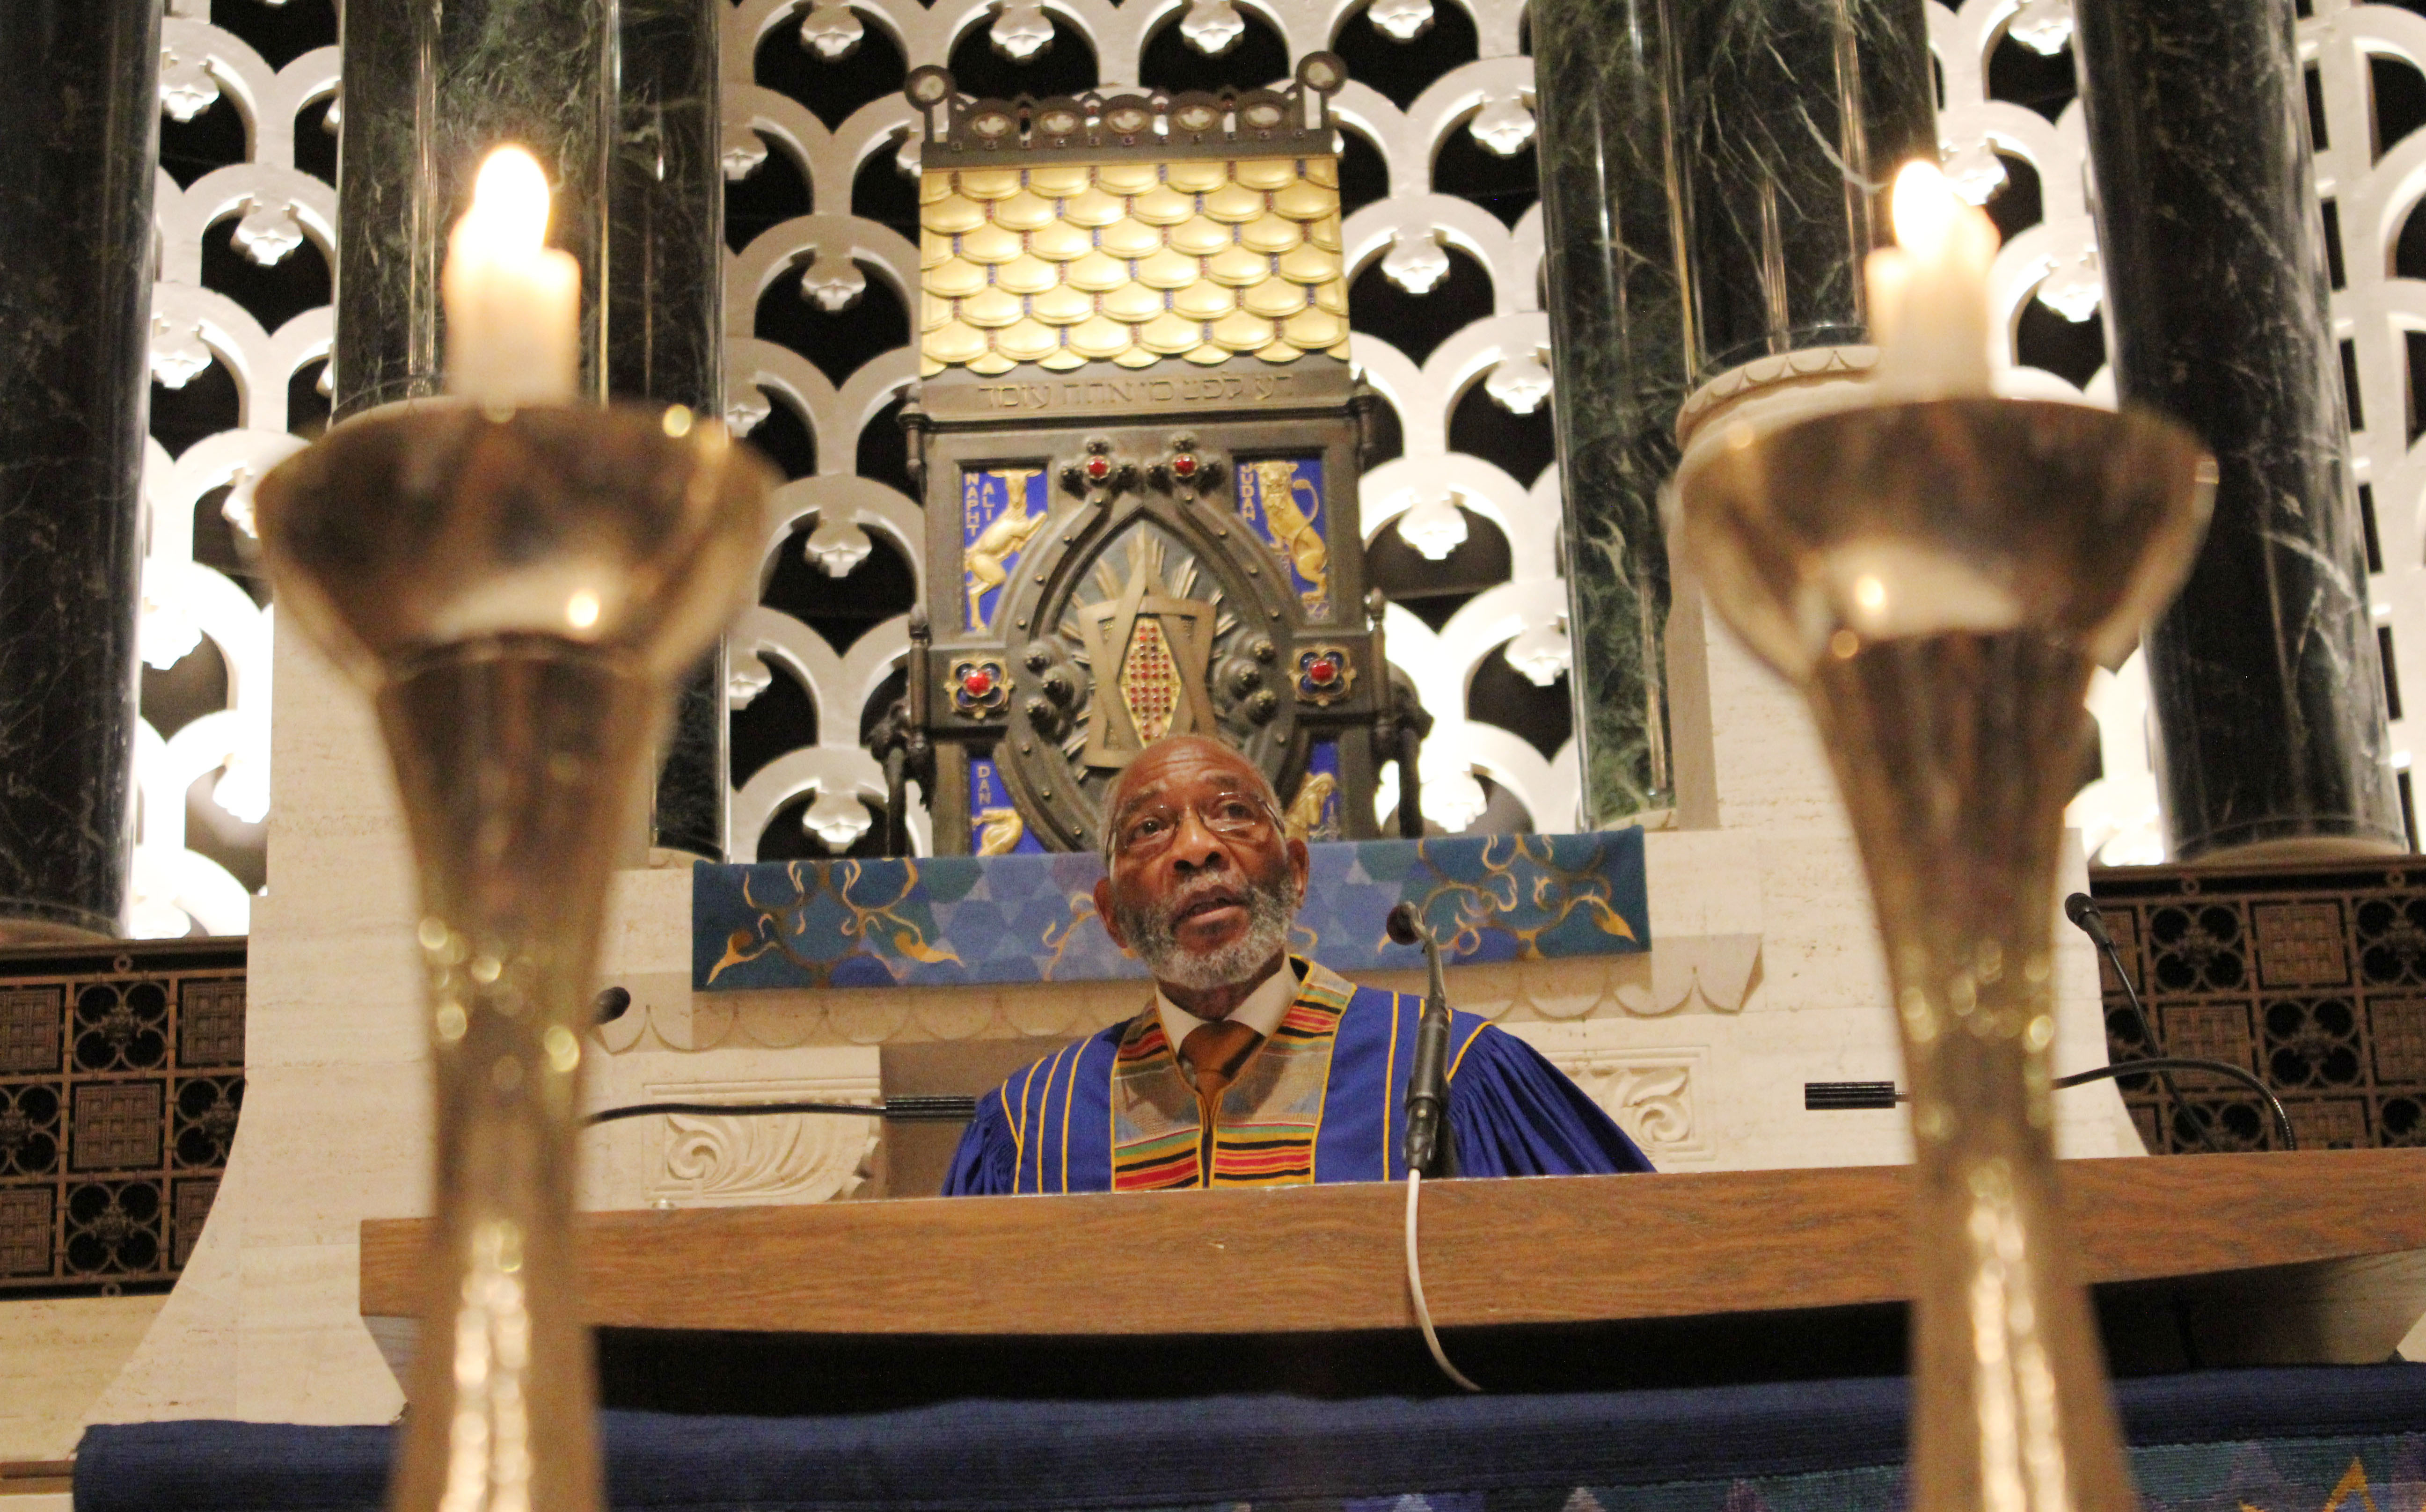 Rev. Amos C. Brown of Third Baptist Church delivers his annual MLK weekend sermon at Congregation Emanu-El in San Francisco, Jan. 12, 2018 (Photo/David A.M. Wilensky)